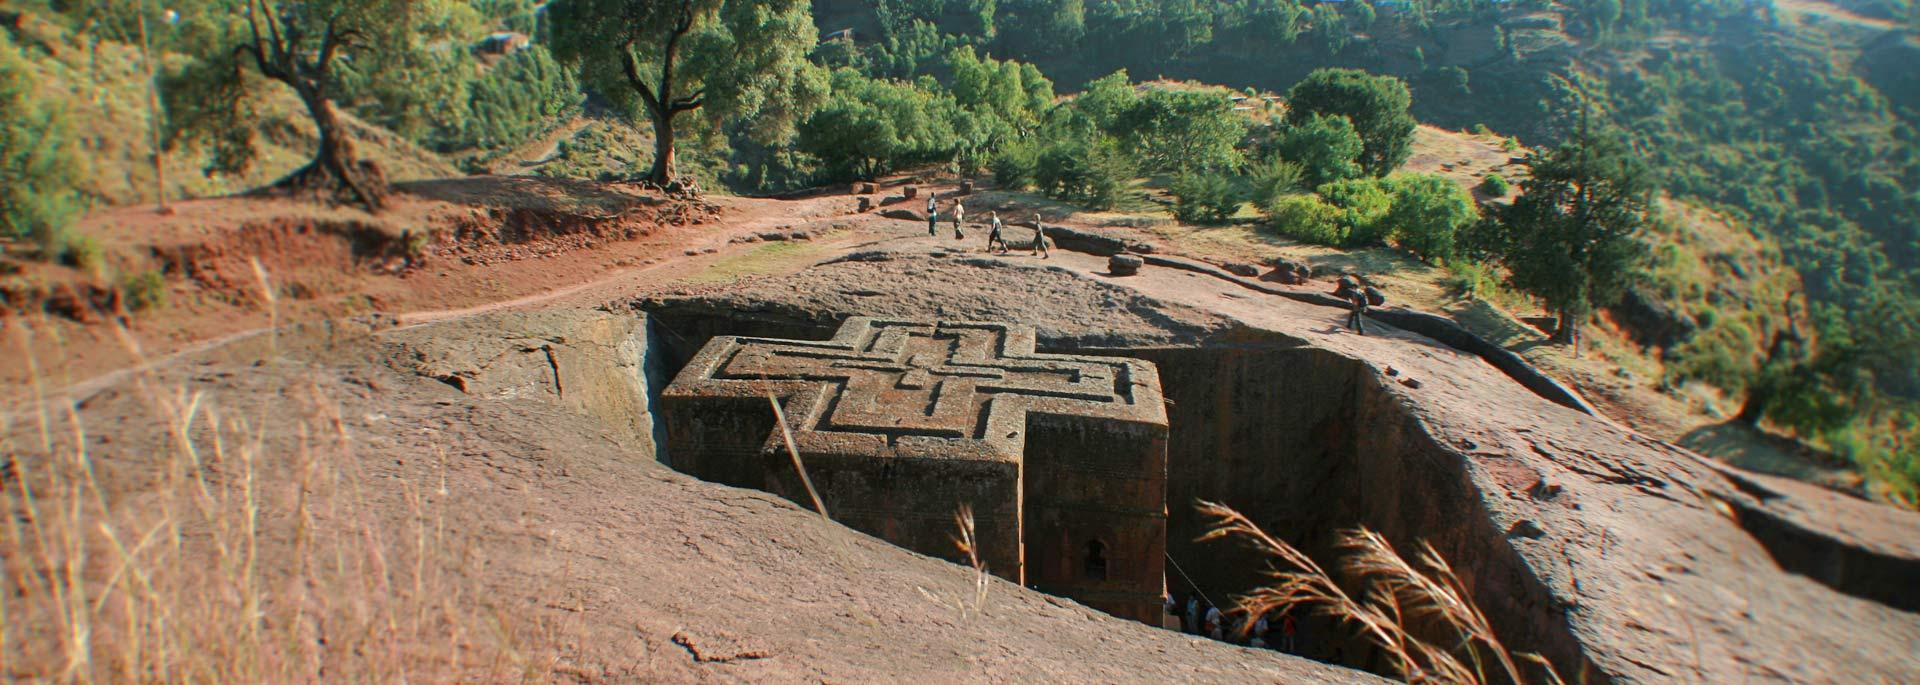 Lalibelas Felsenkirchen hinterlassen viele Eindrücke